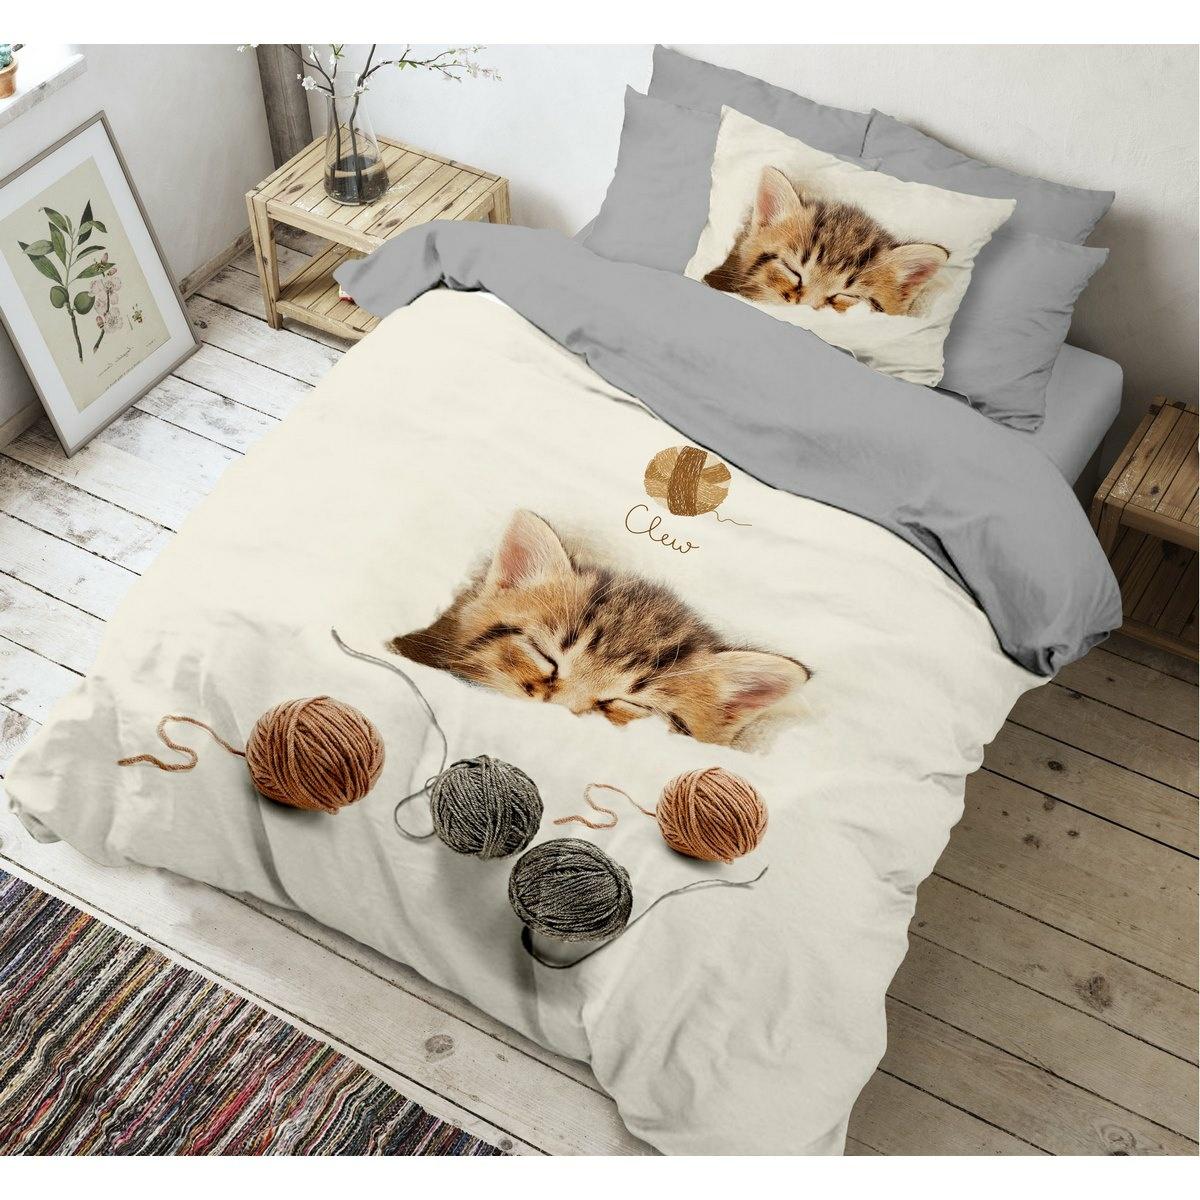 Kvalitex Bavlnené obliečky Kitten 3D, 140 x 200 cm, 70 x 90 cm